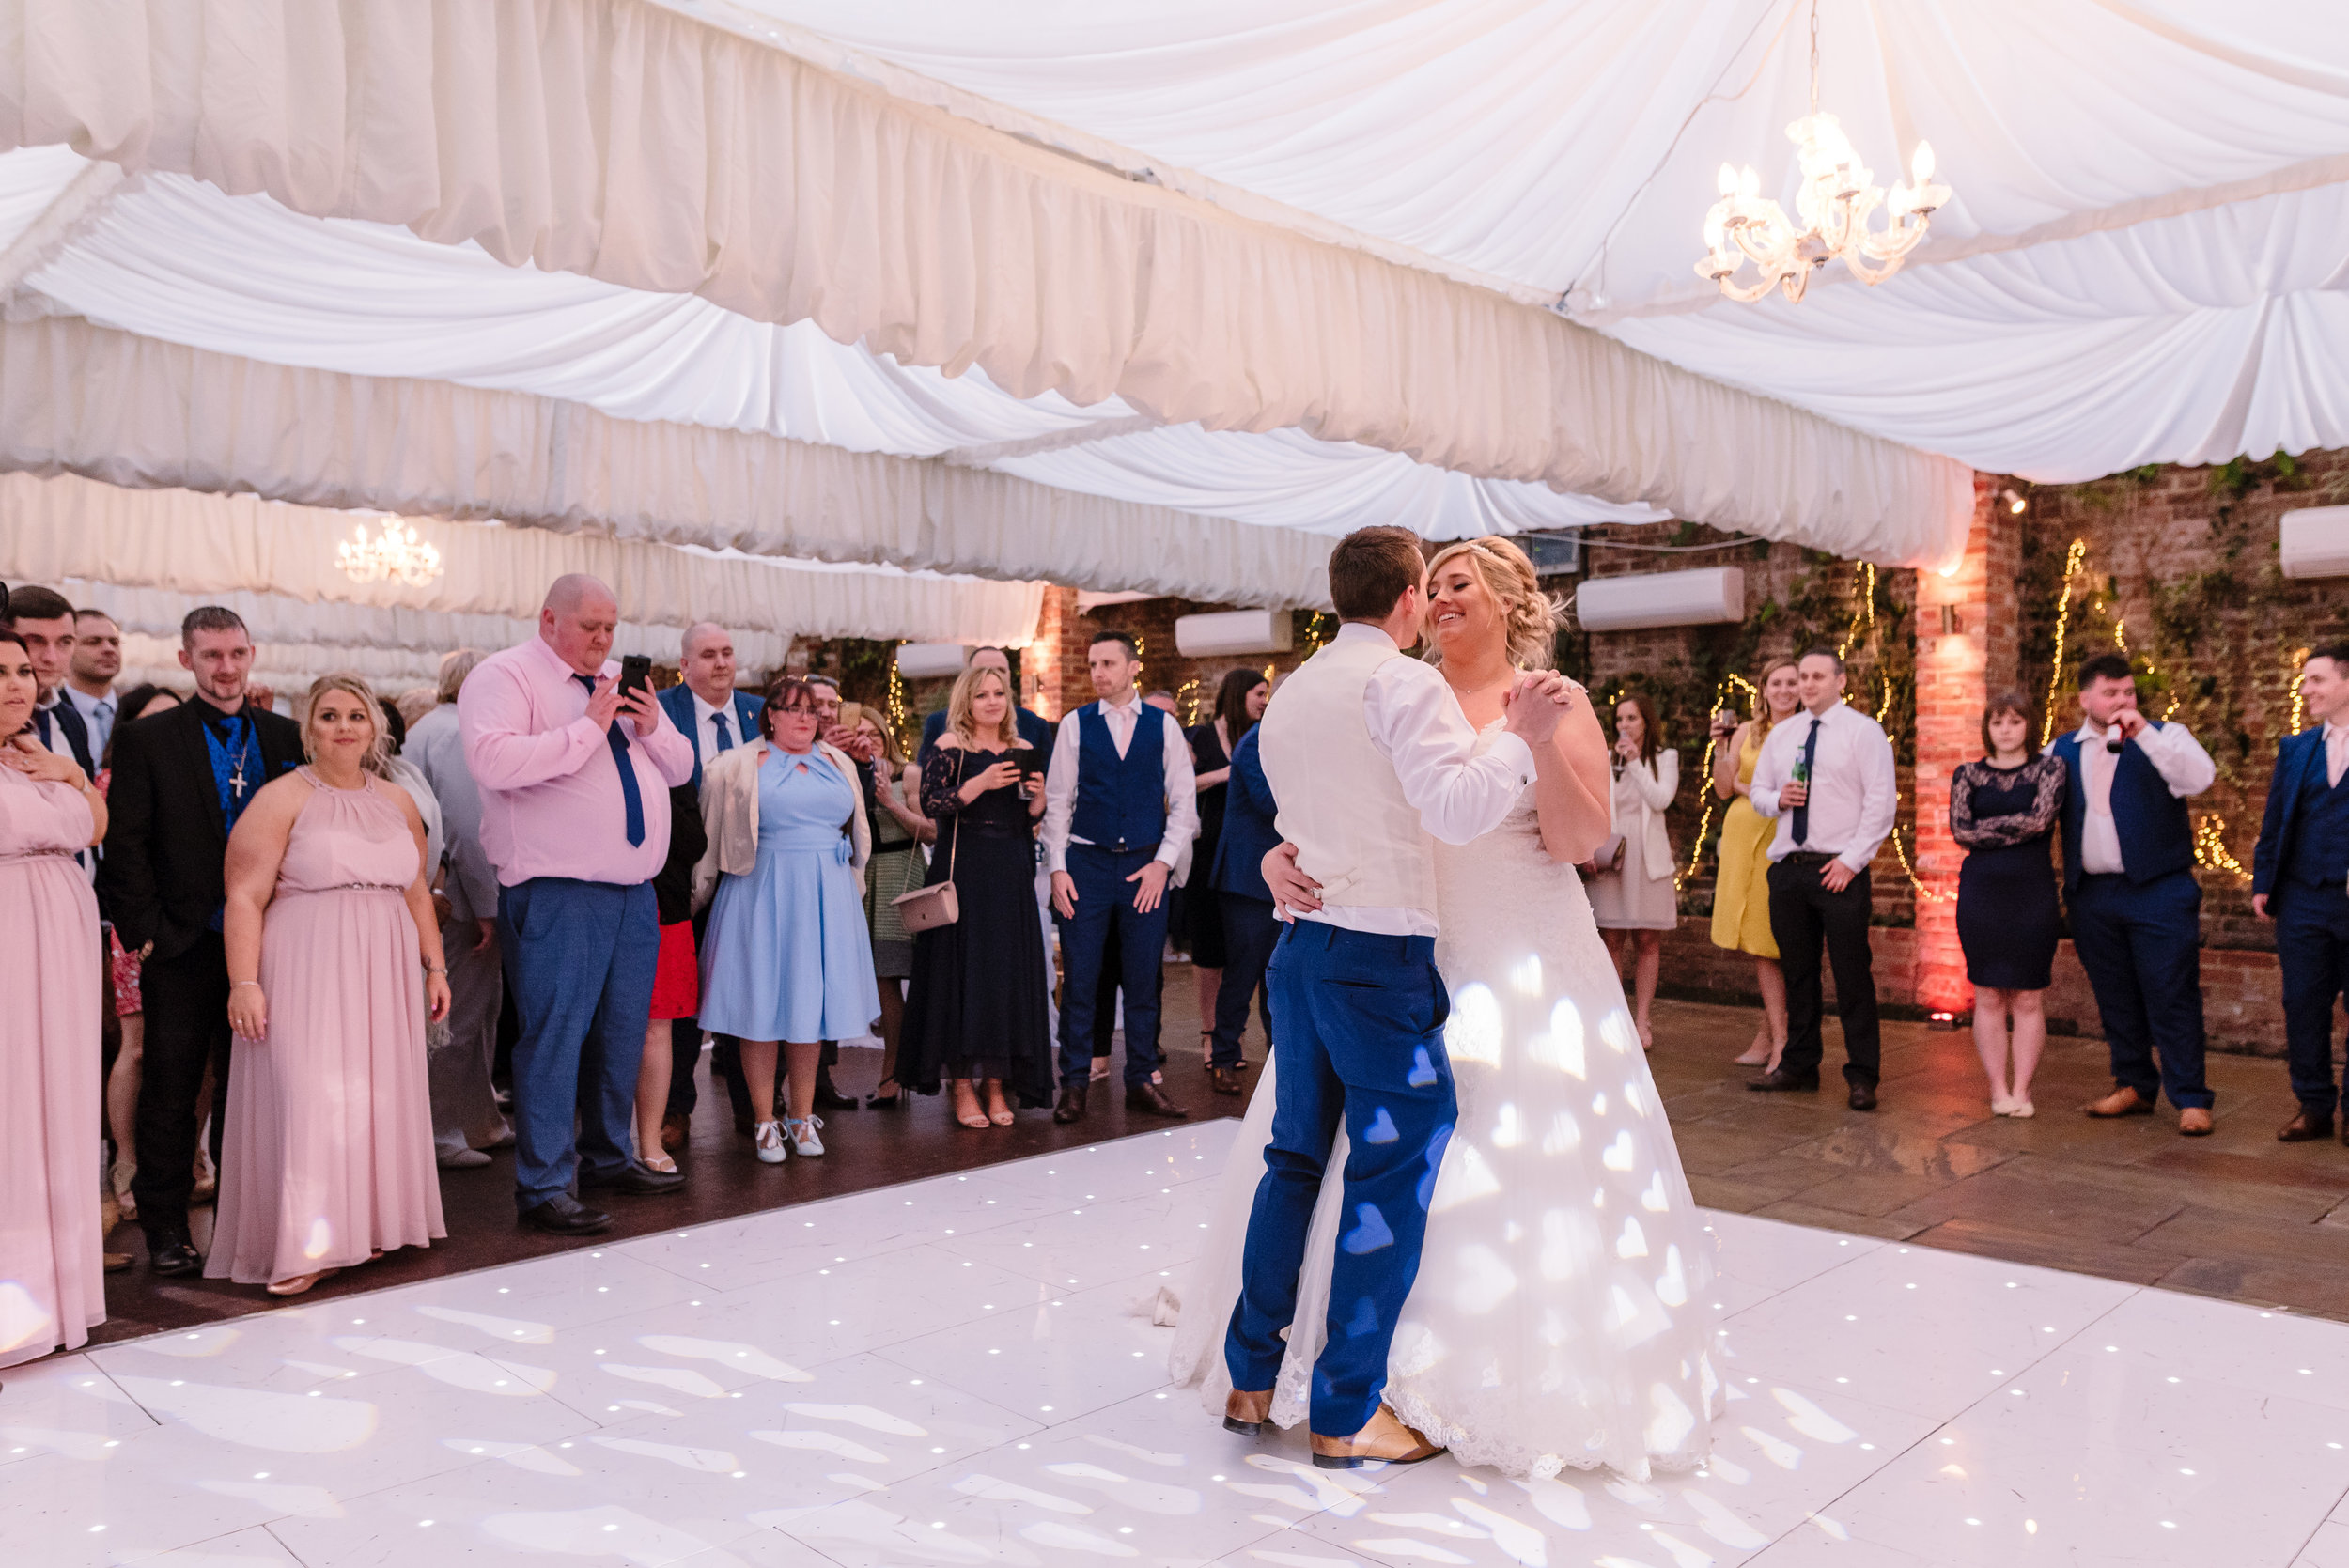 Sarah-Fishlock-Photography : Hampshire-wedding-photographer-hampshire : fleet-wedding-photographer-fleet : Northbrook-Park-Wedding-Photographer : Northbrook-Park-Wedding-Venue : natural-wedding-photographer-hampshire-